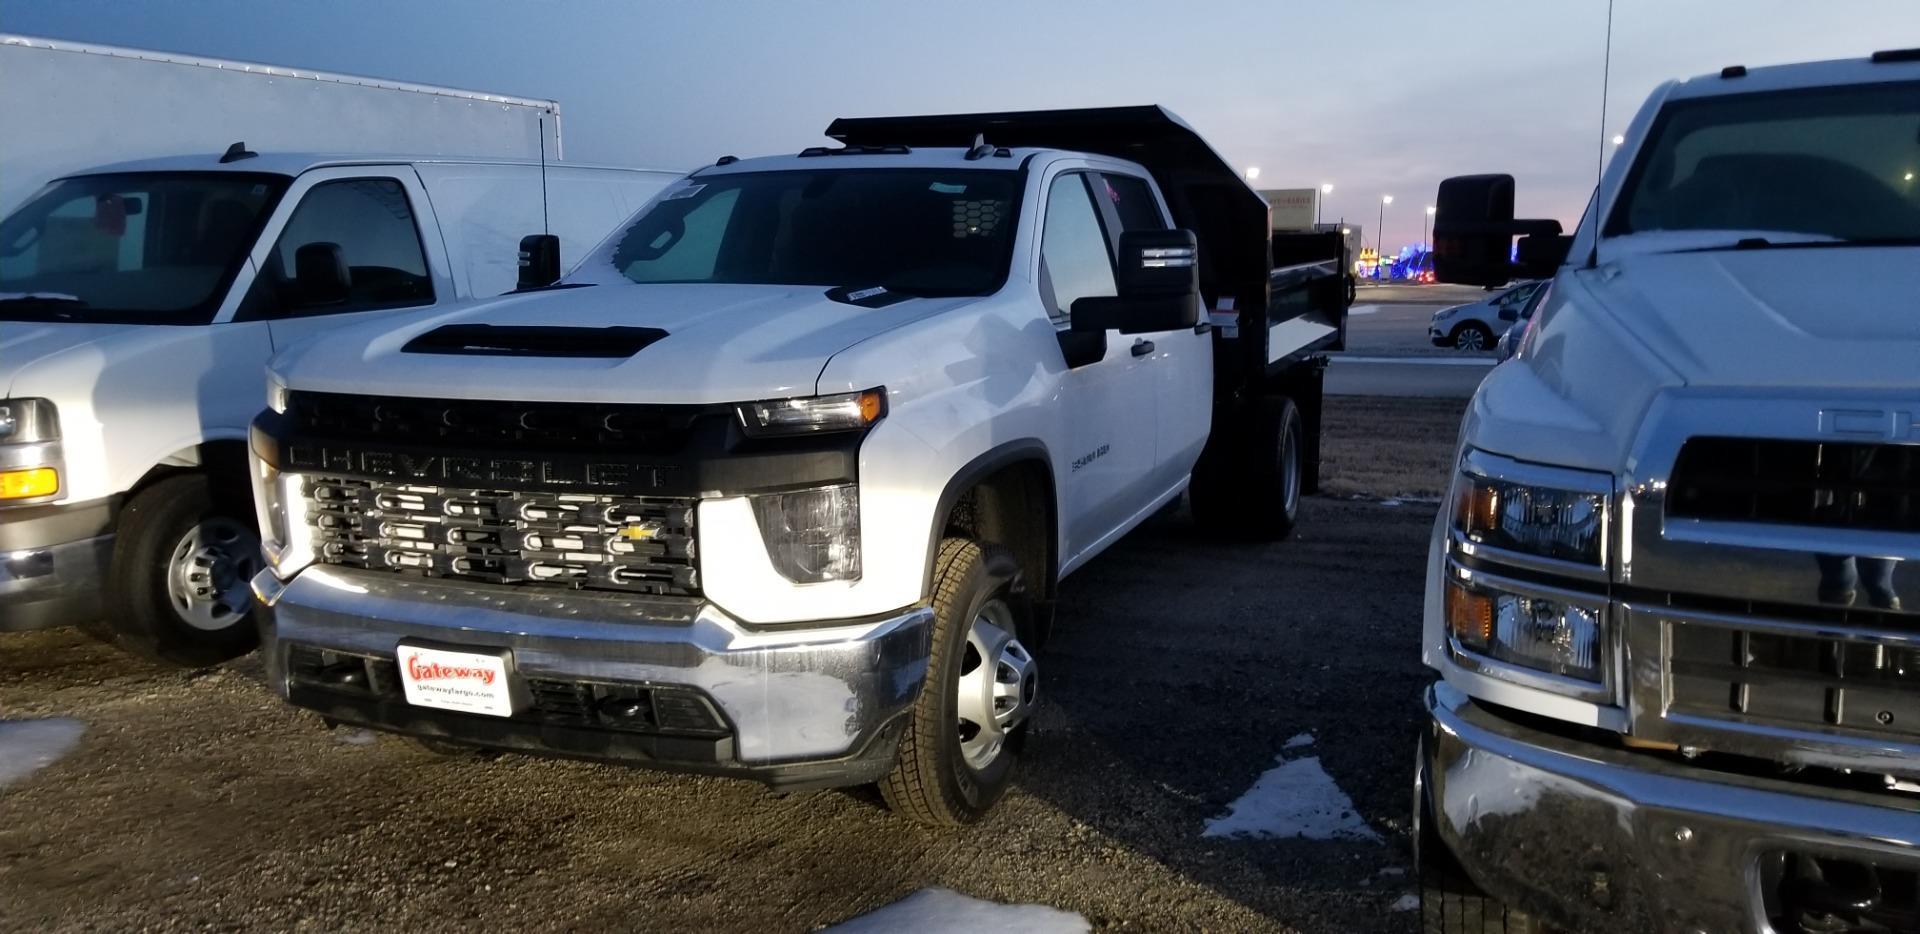 2020 Chevrolet Silverado 3500 Crew Cab DRW 4x4, Knapheide Dump Body #LF290856 - photo 1